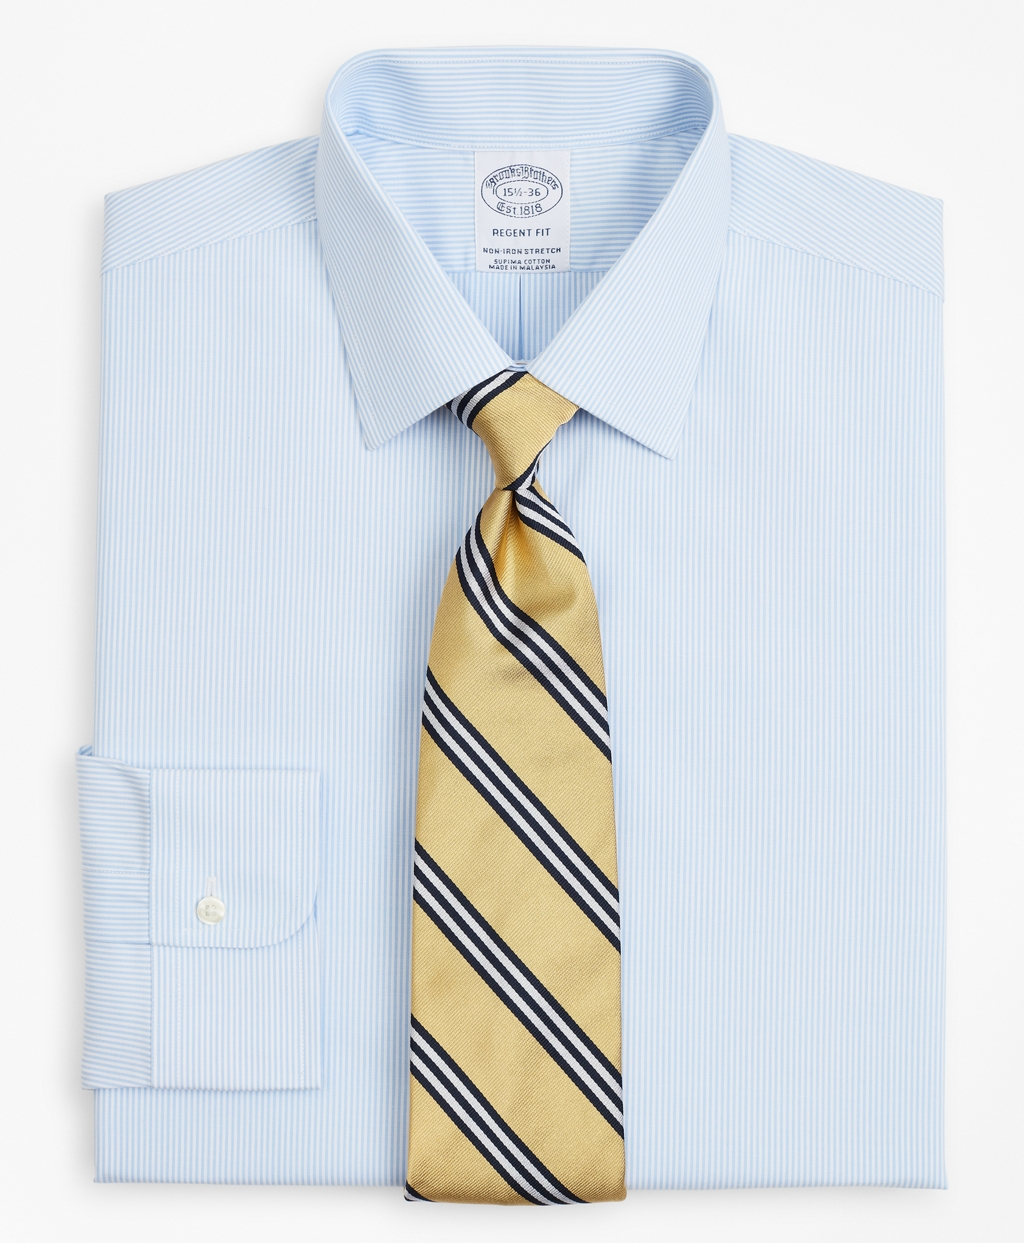 Brooksbrothers Stretch Regent Regular-Fit Dress Shirt, Non-Iron Poplin Ainsley Collar Fine Stripe